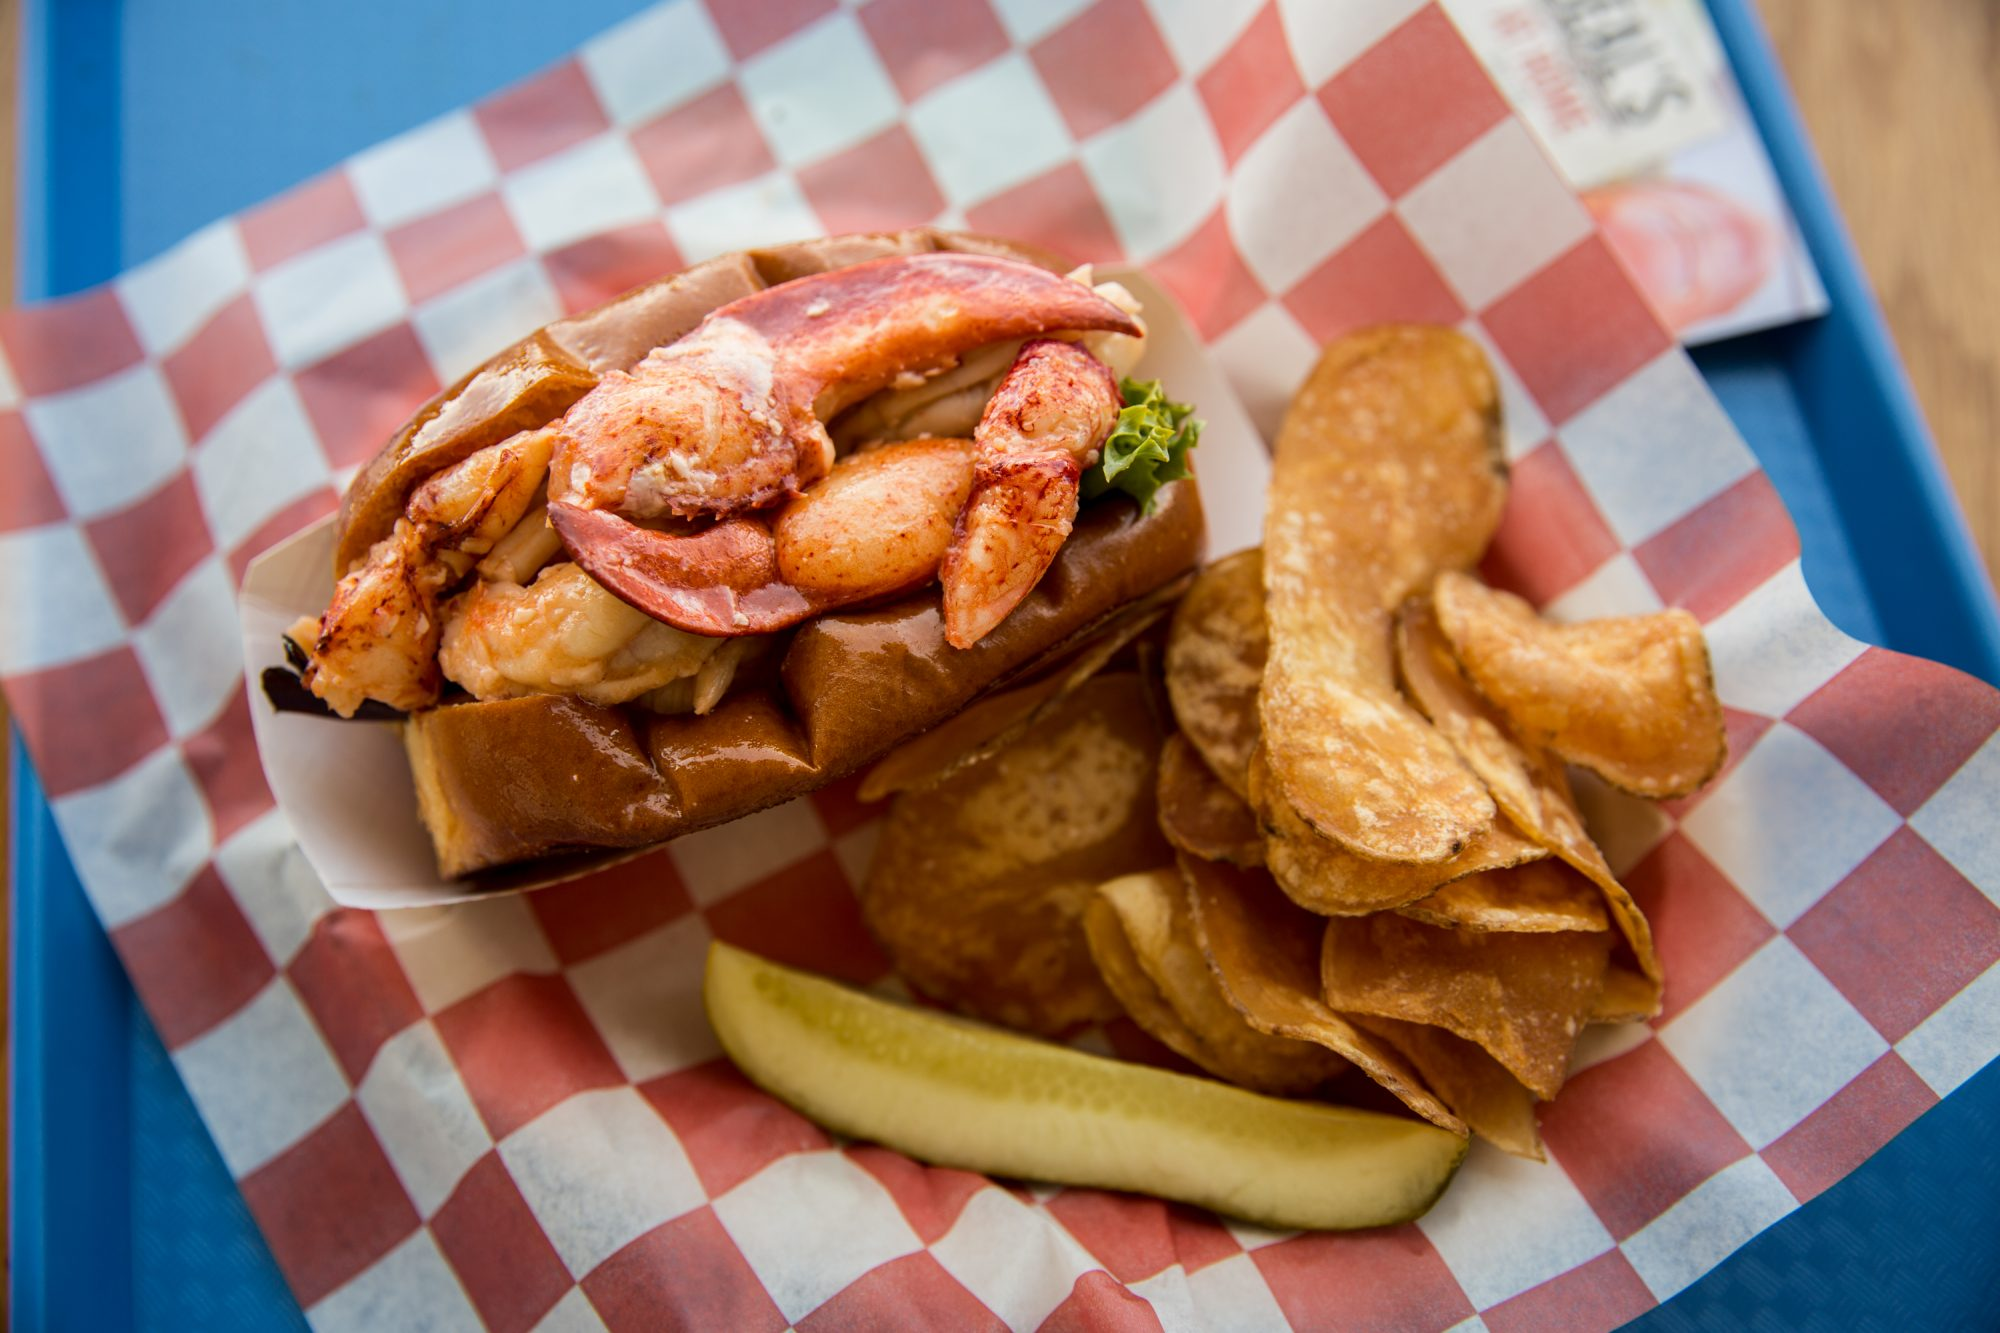 Beal's Lobster Pier